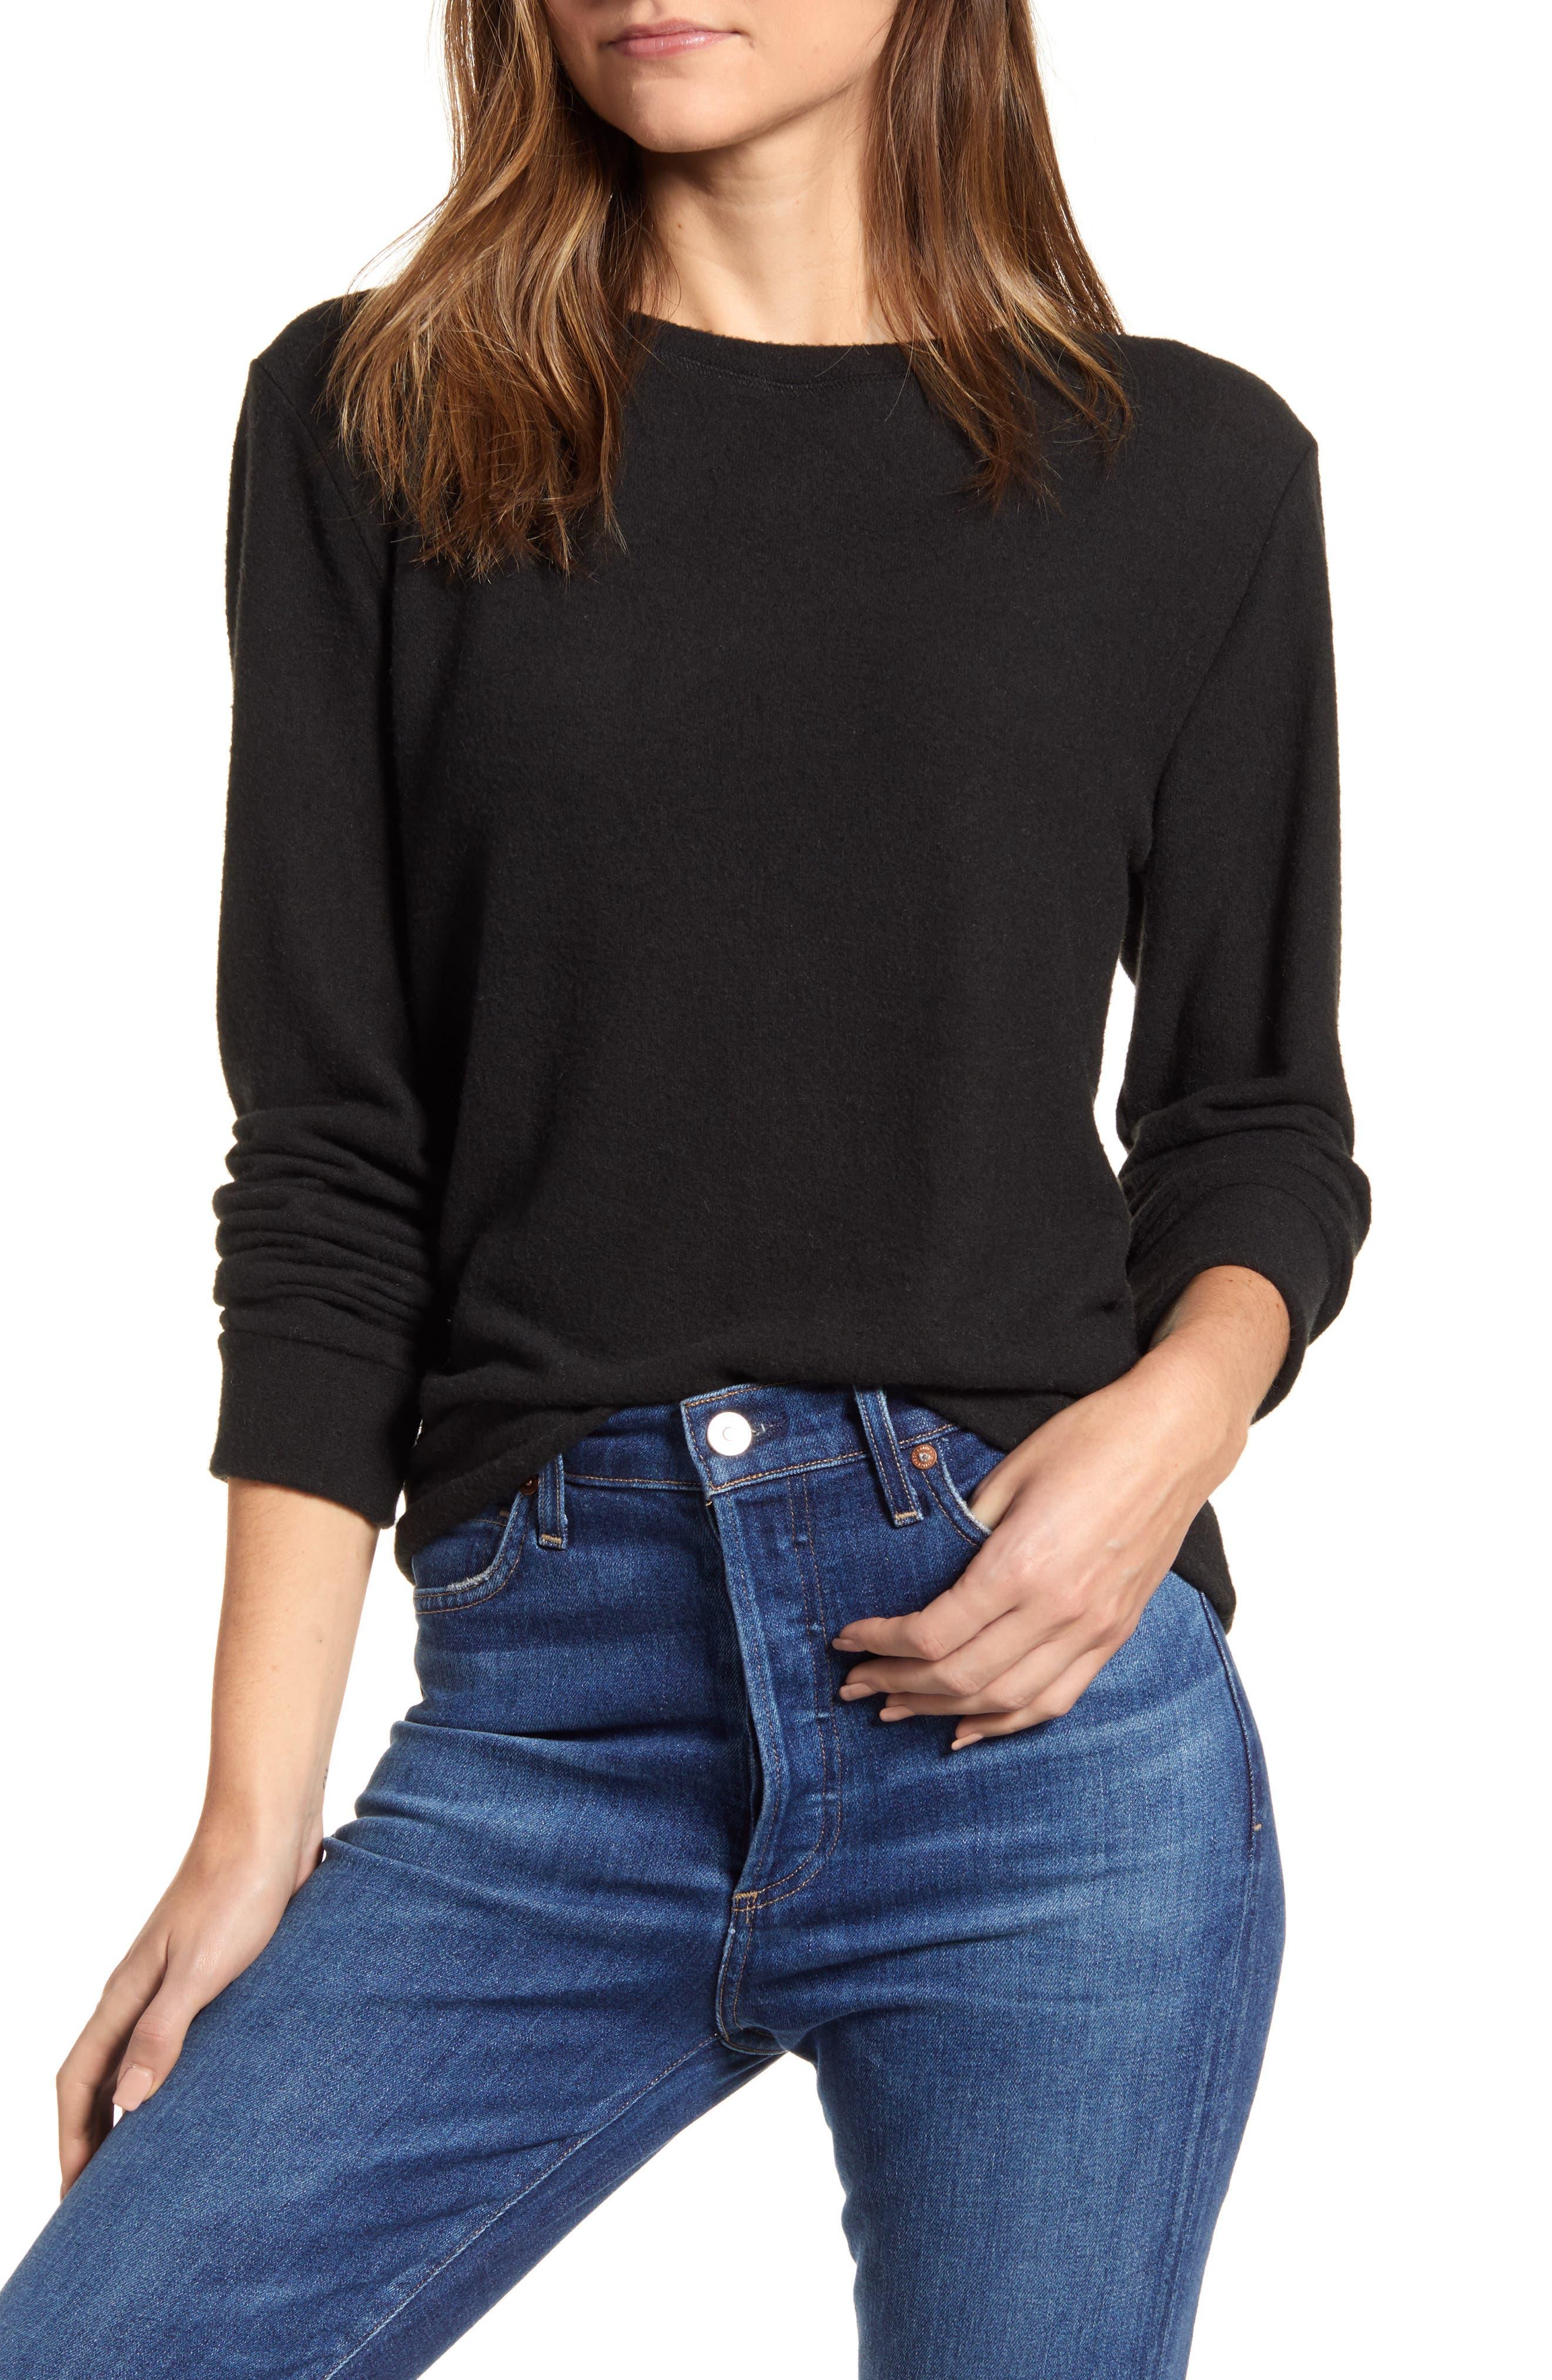 Women's Loveapella Cozy Crewneck Long Sleeve Top